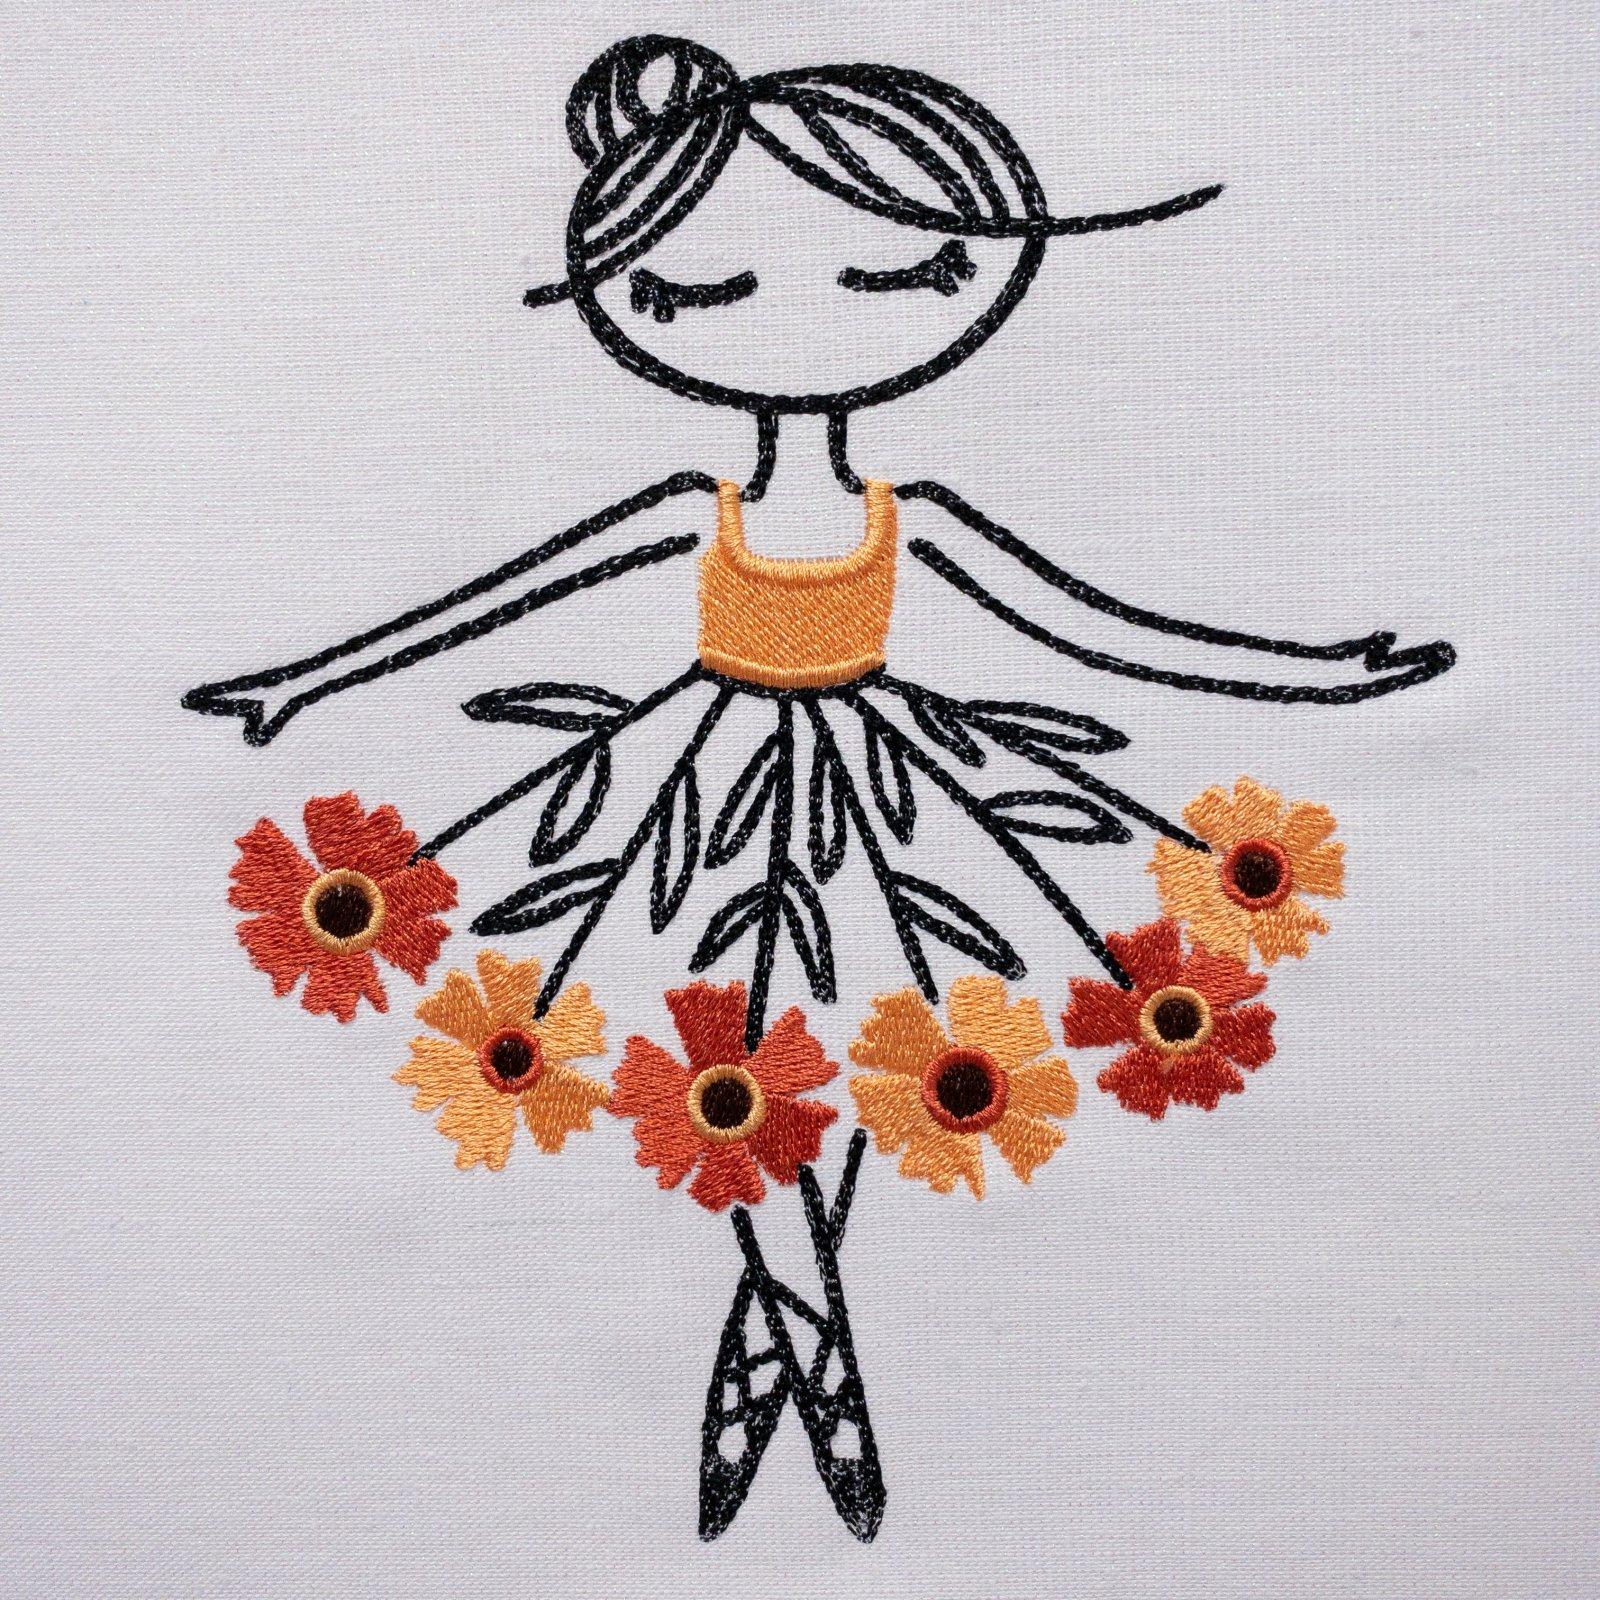 Helenium Ballerina Embroidered Panel